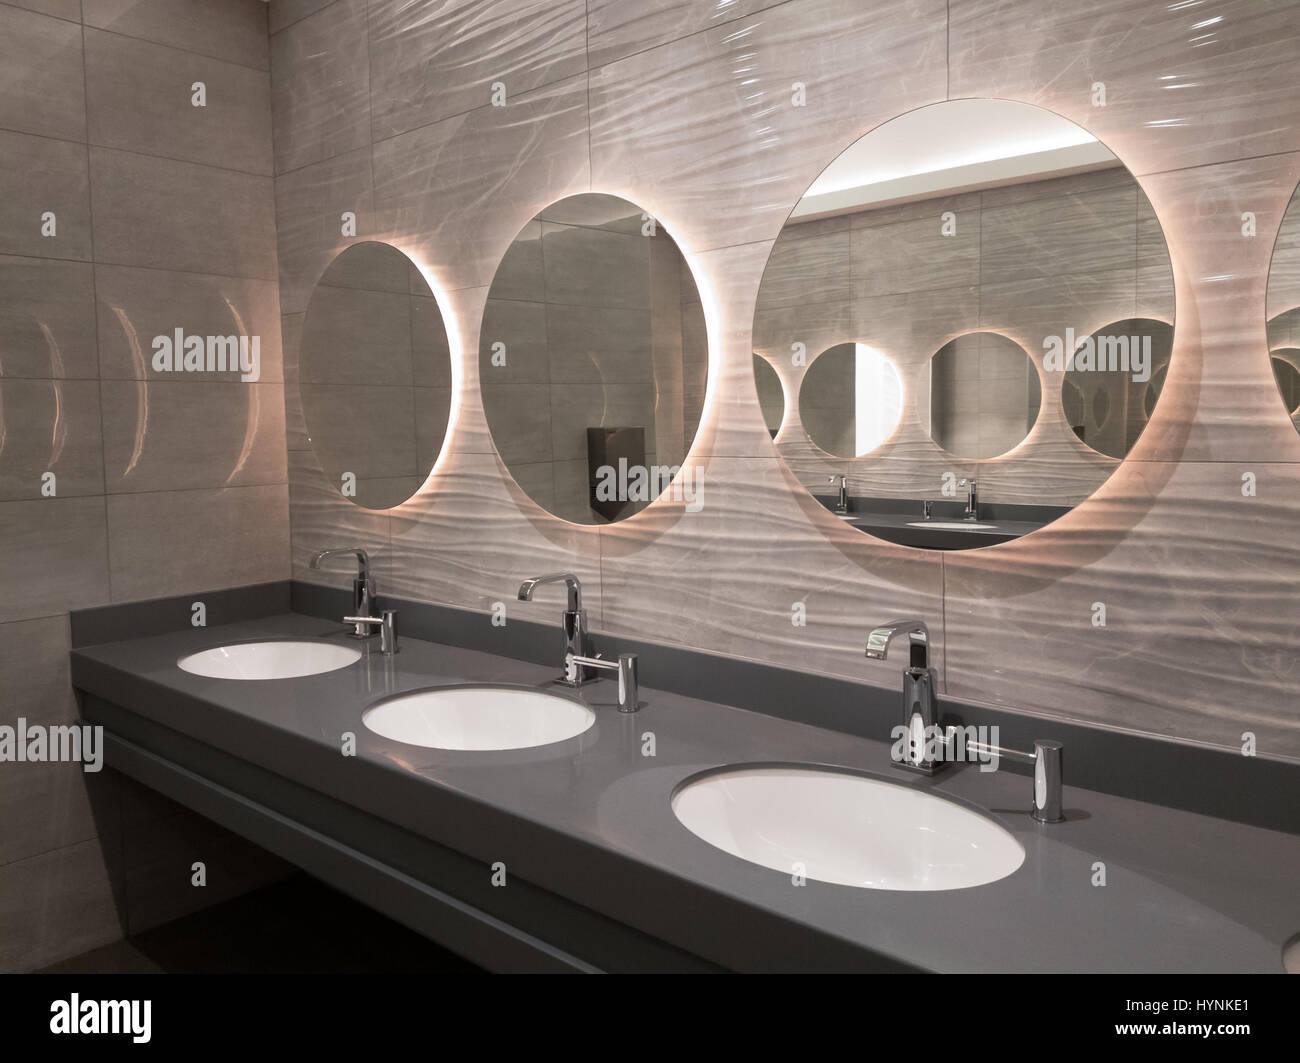 Modern public washroom interior Stock Photo, Royalty Free Image ...